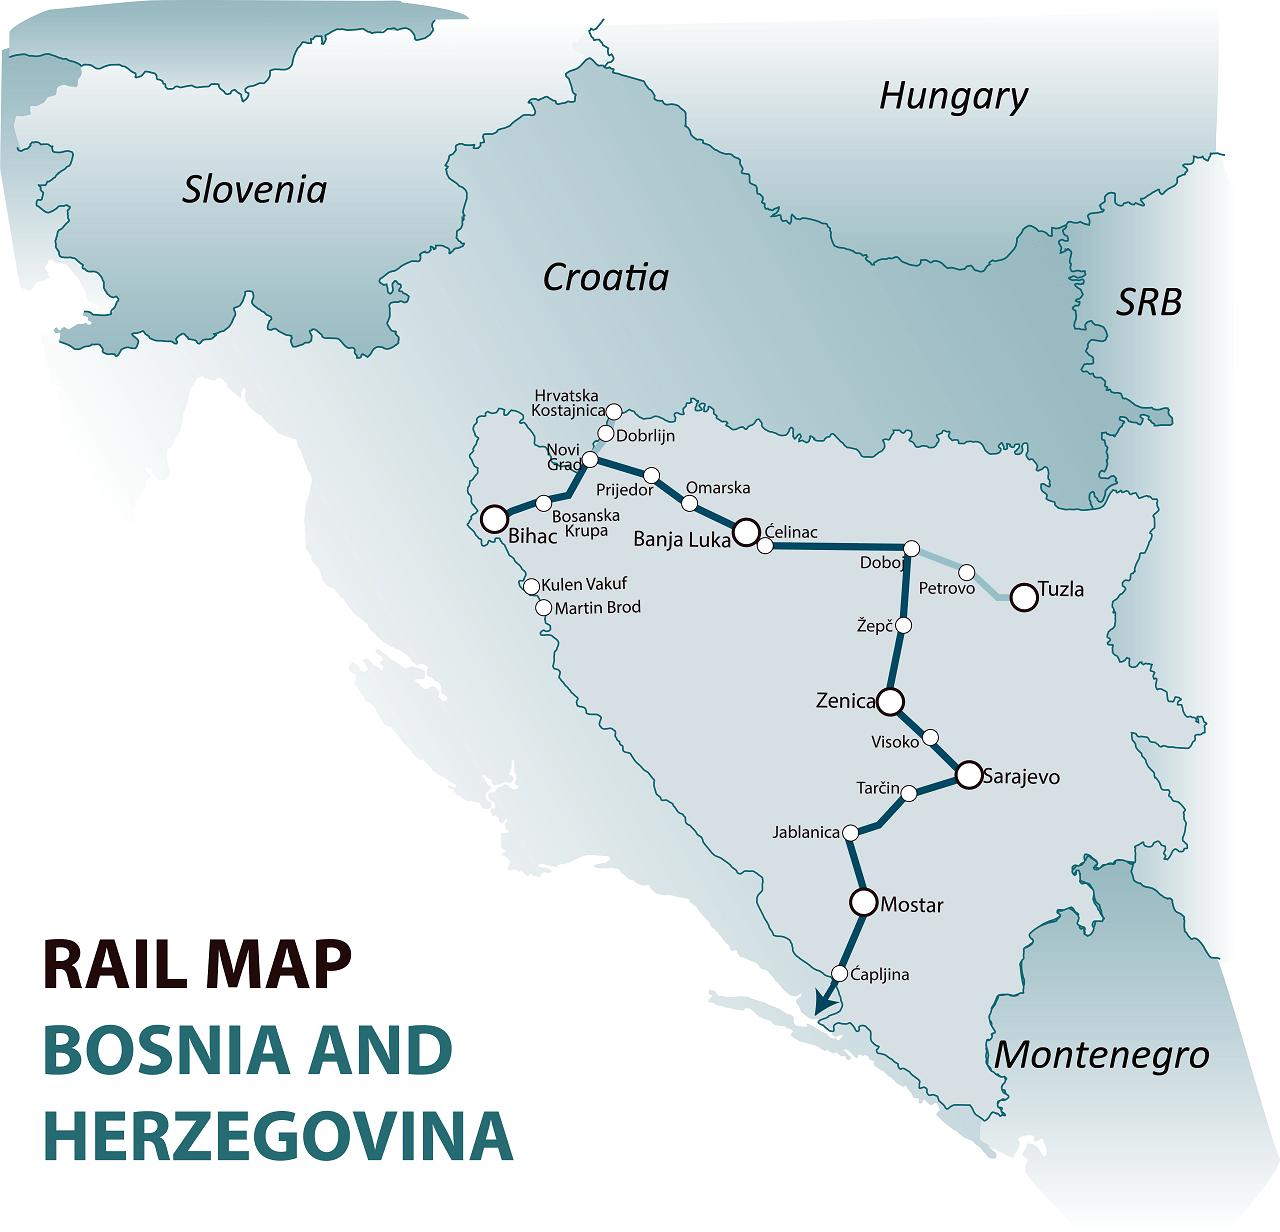 bosnia rail map